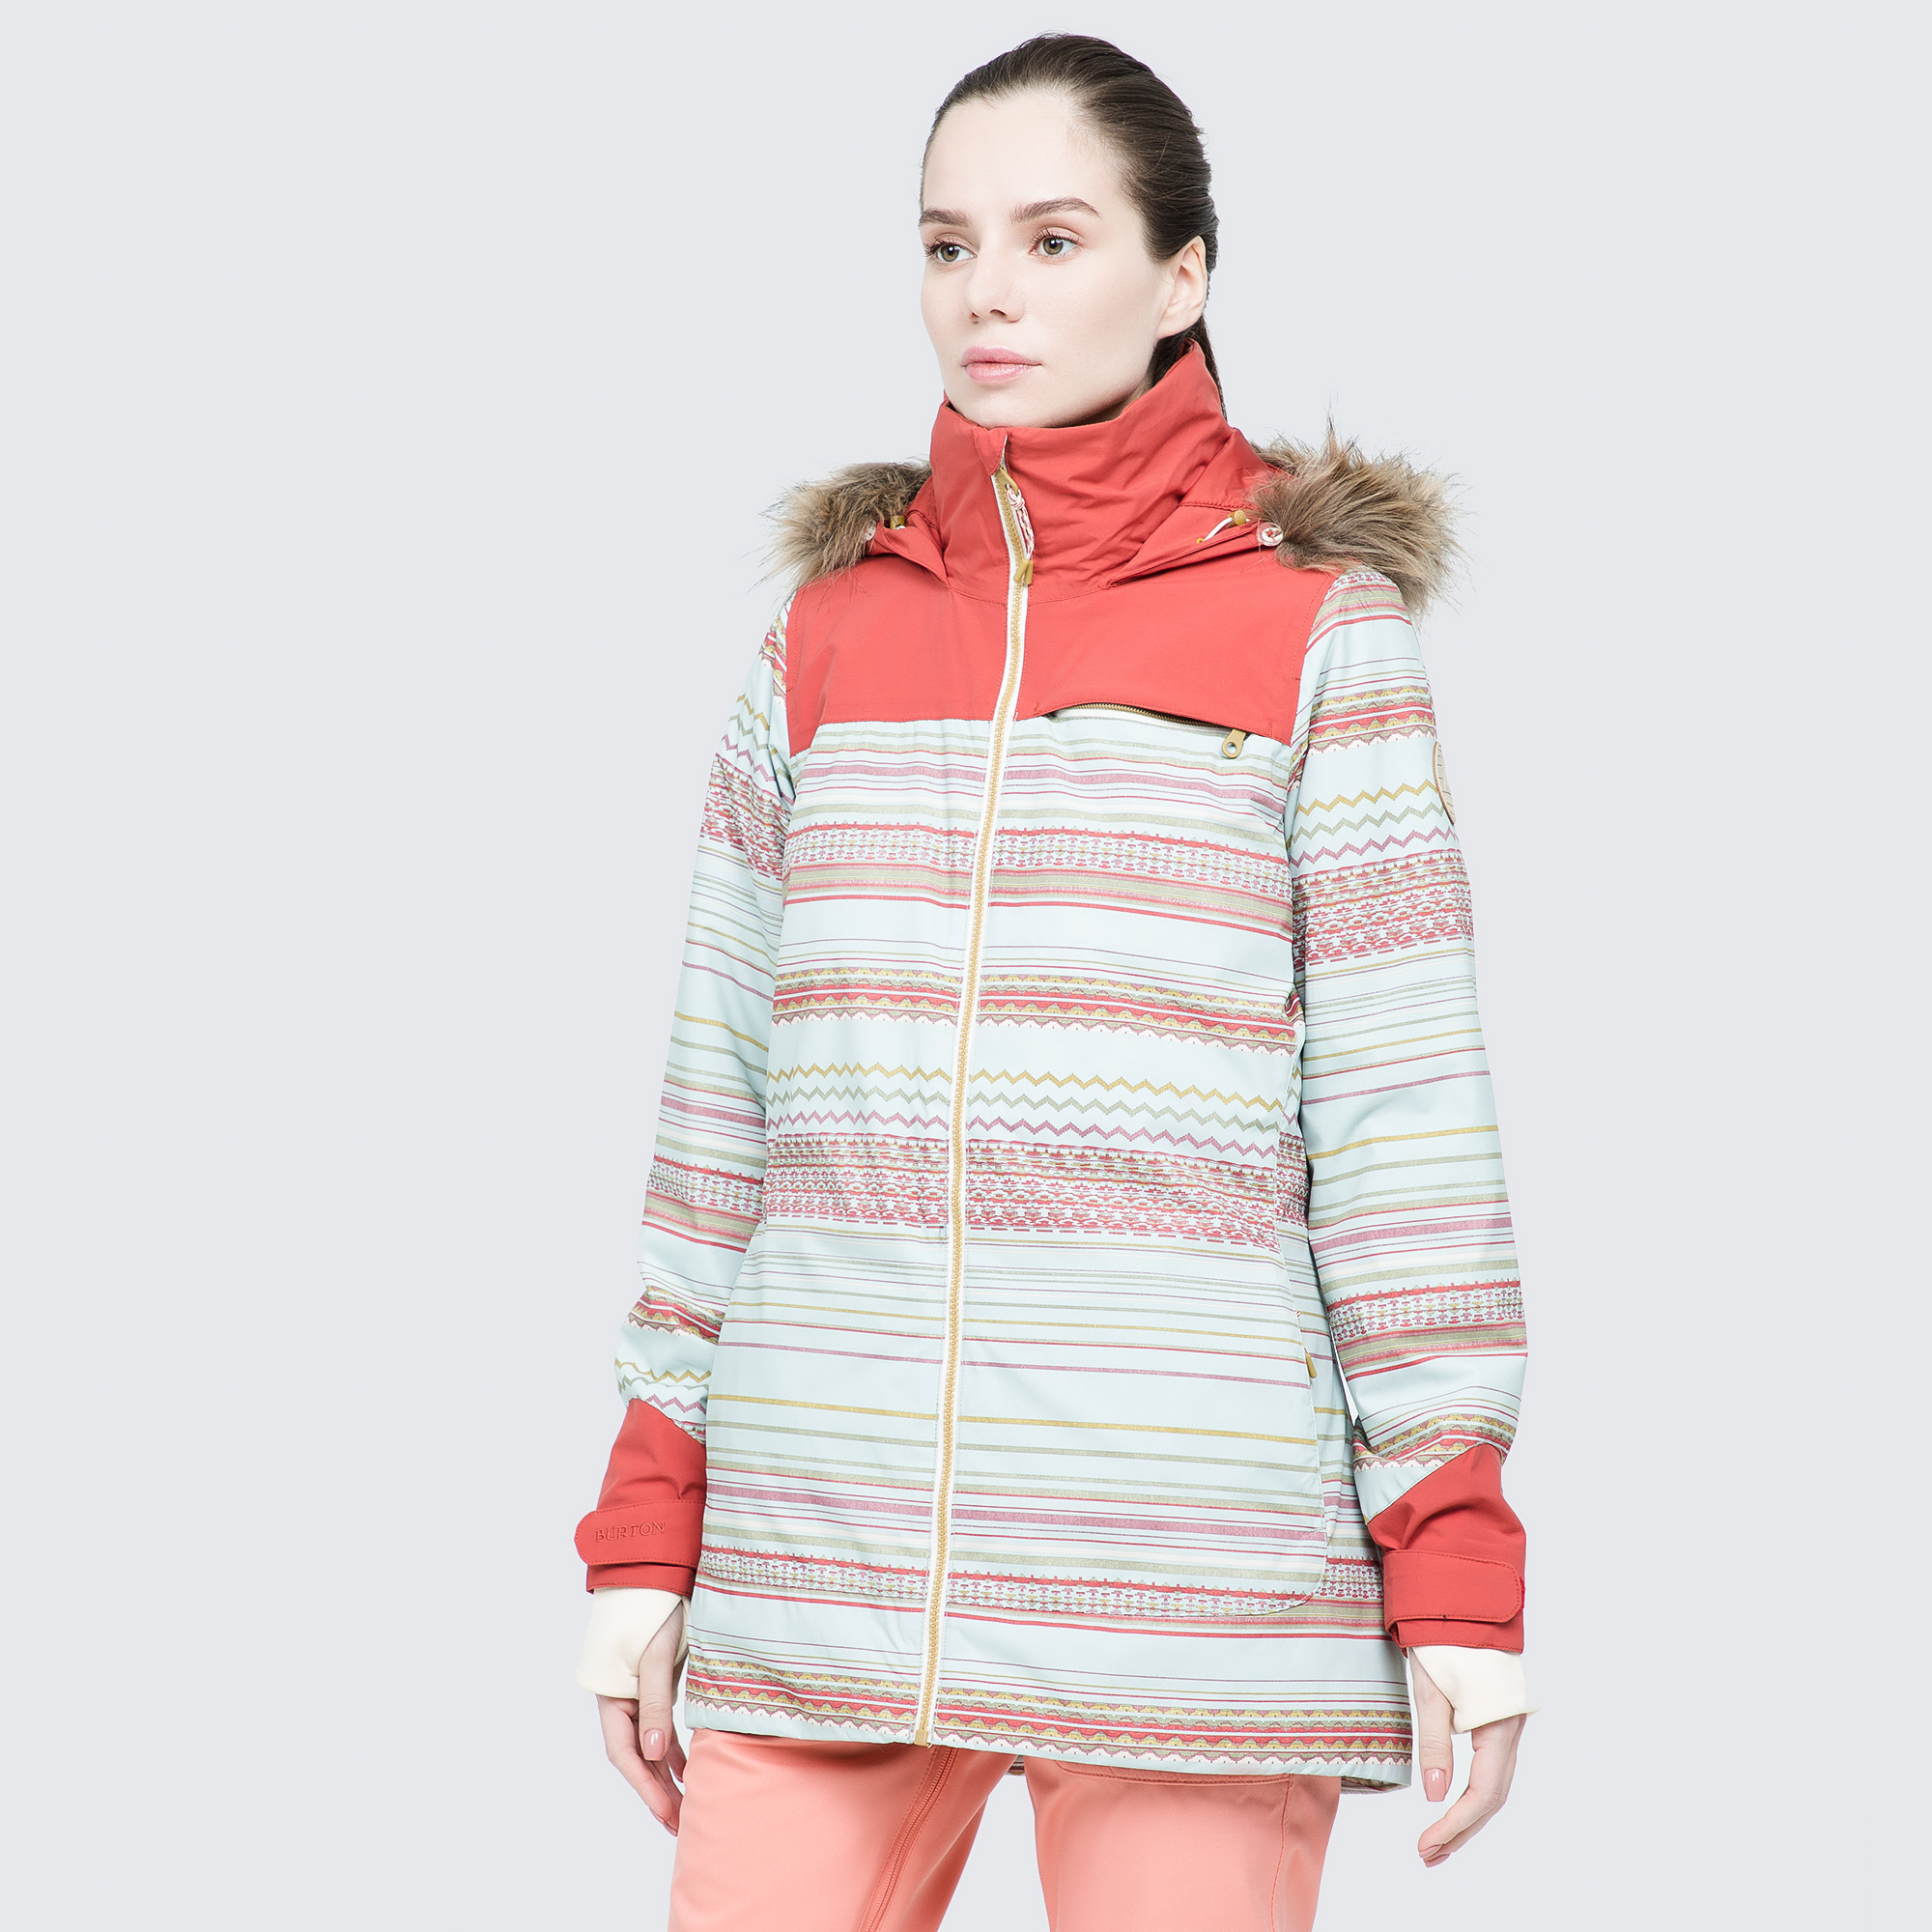 Burton Куртка утепленная женская Burton Lelah, размер 48-50 burton куртка утепленная женская burton minturn размер 48 50